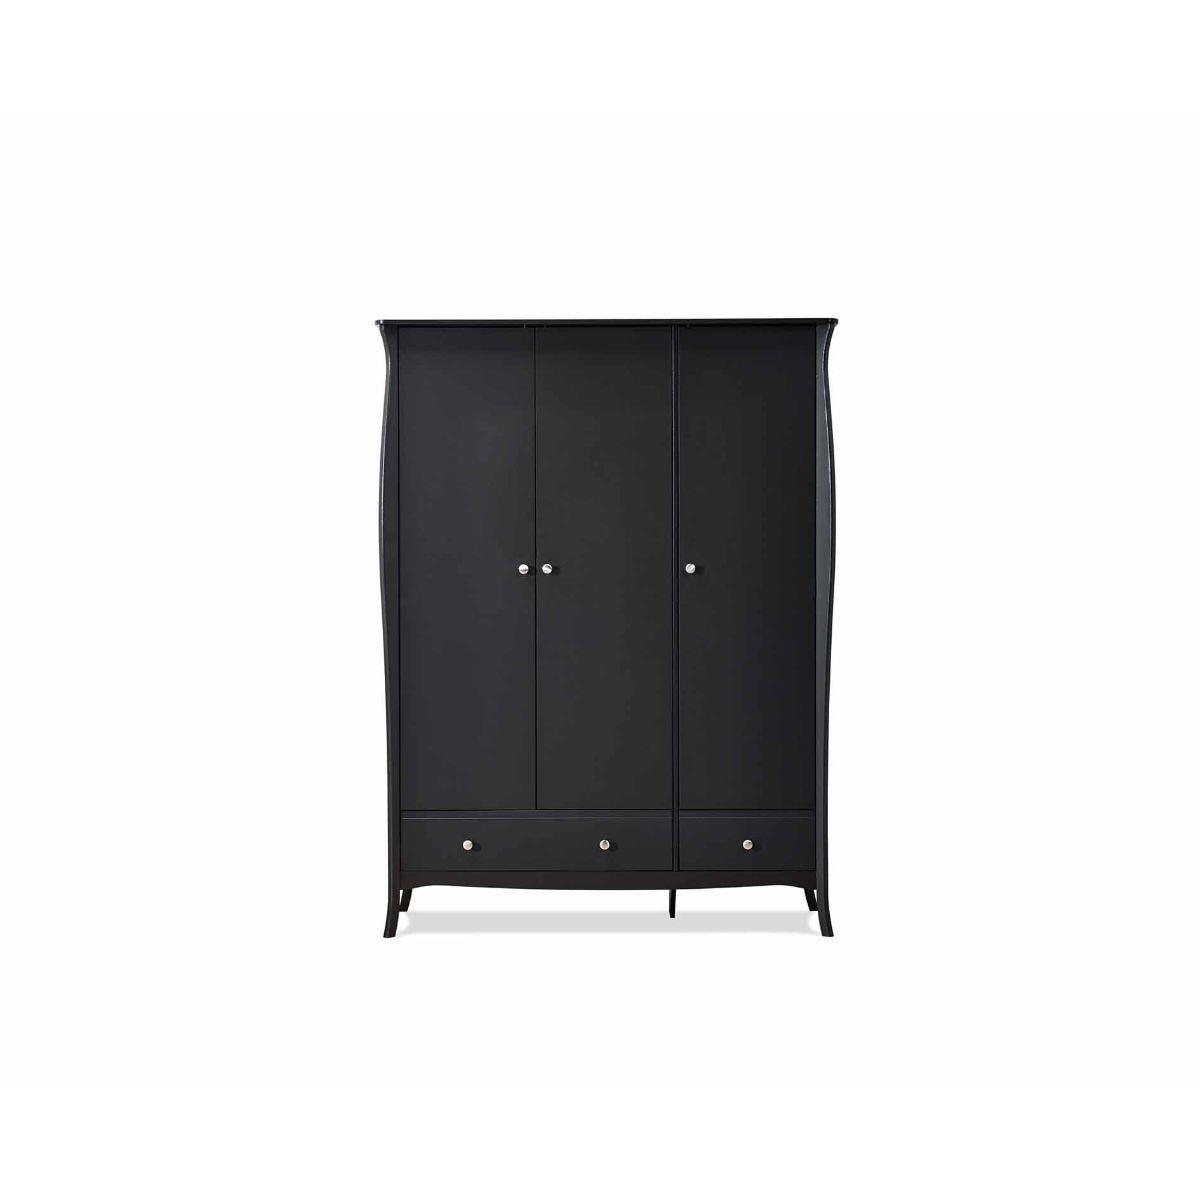 Steens Baroque 3 Door Wardrobe, Black